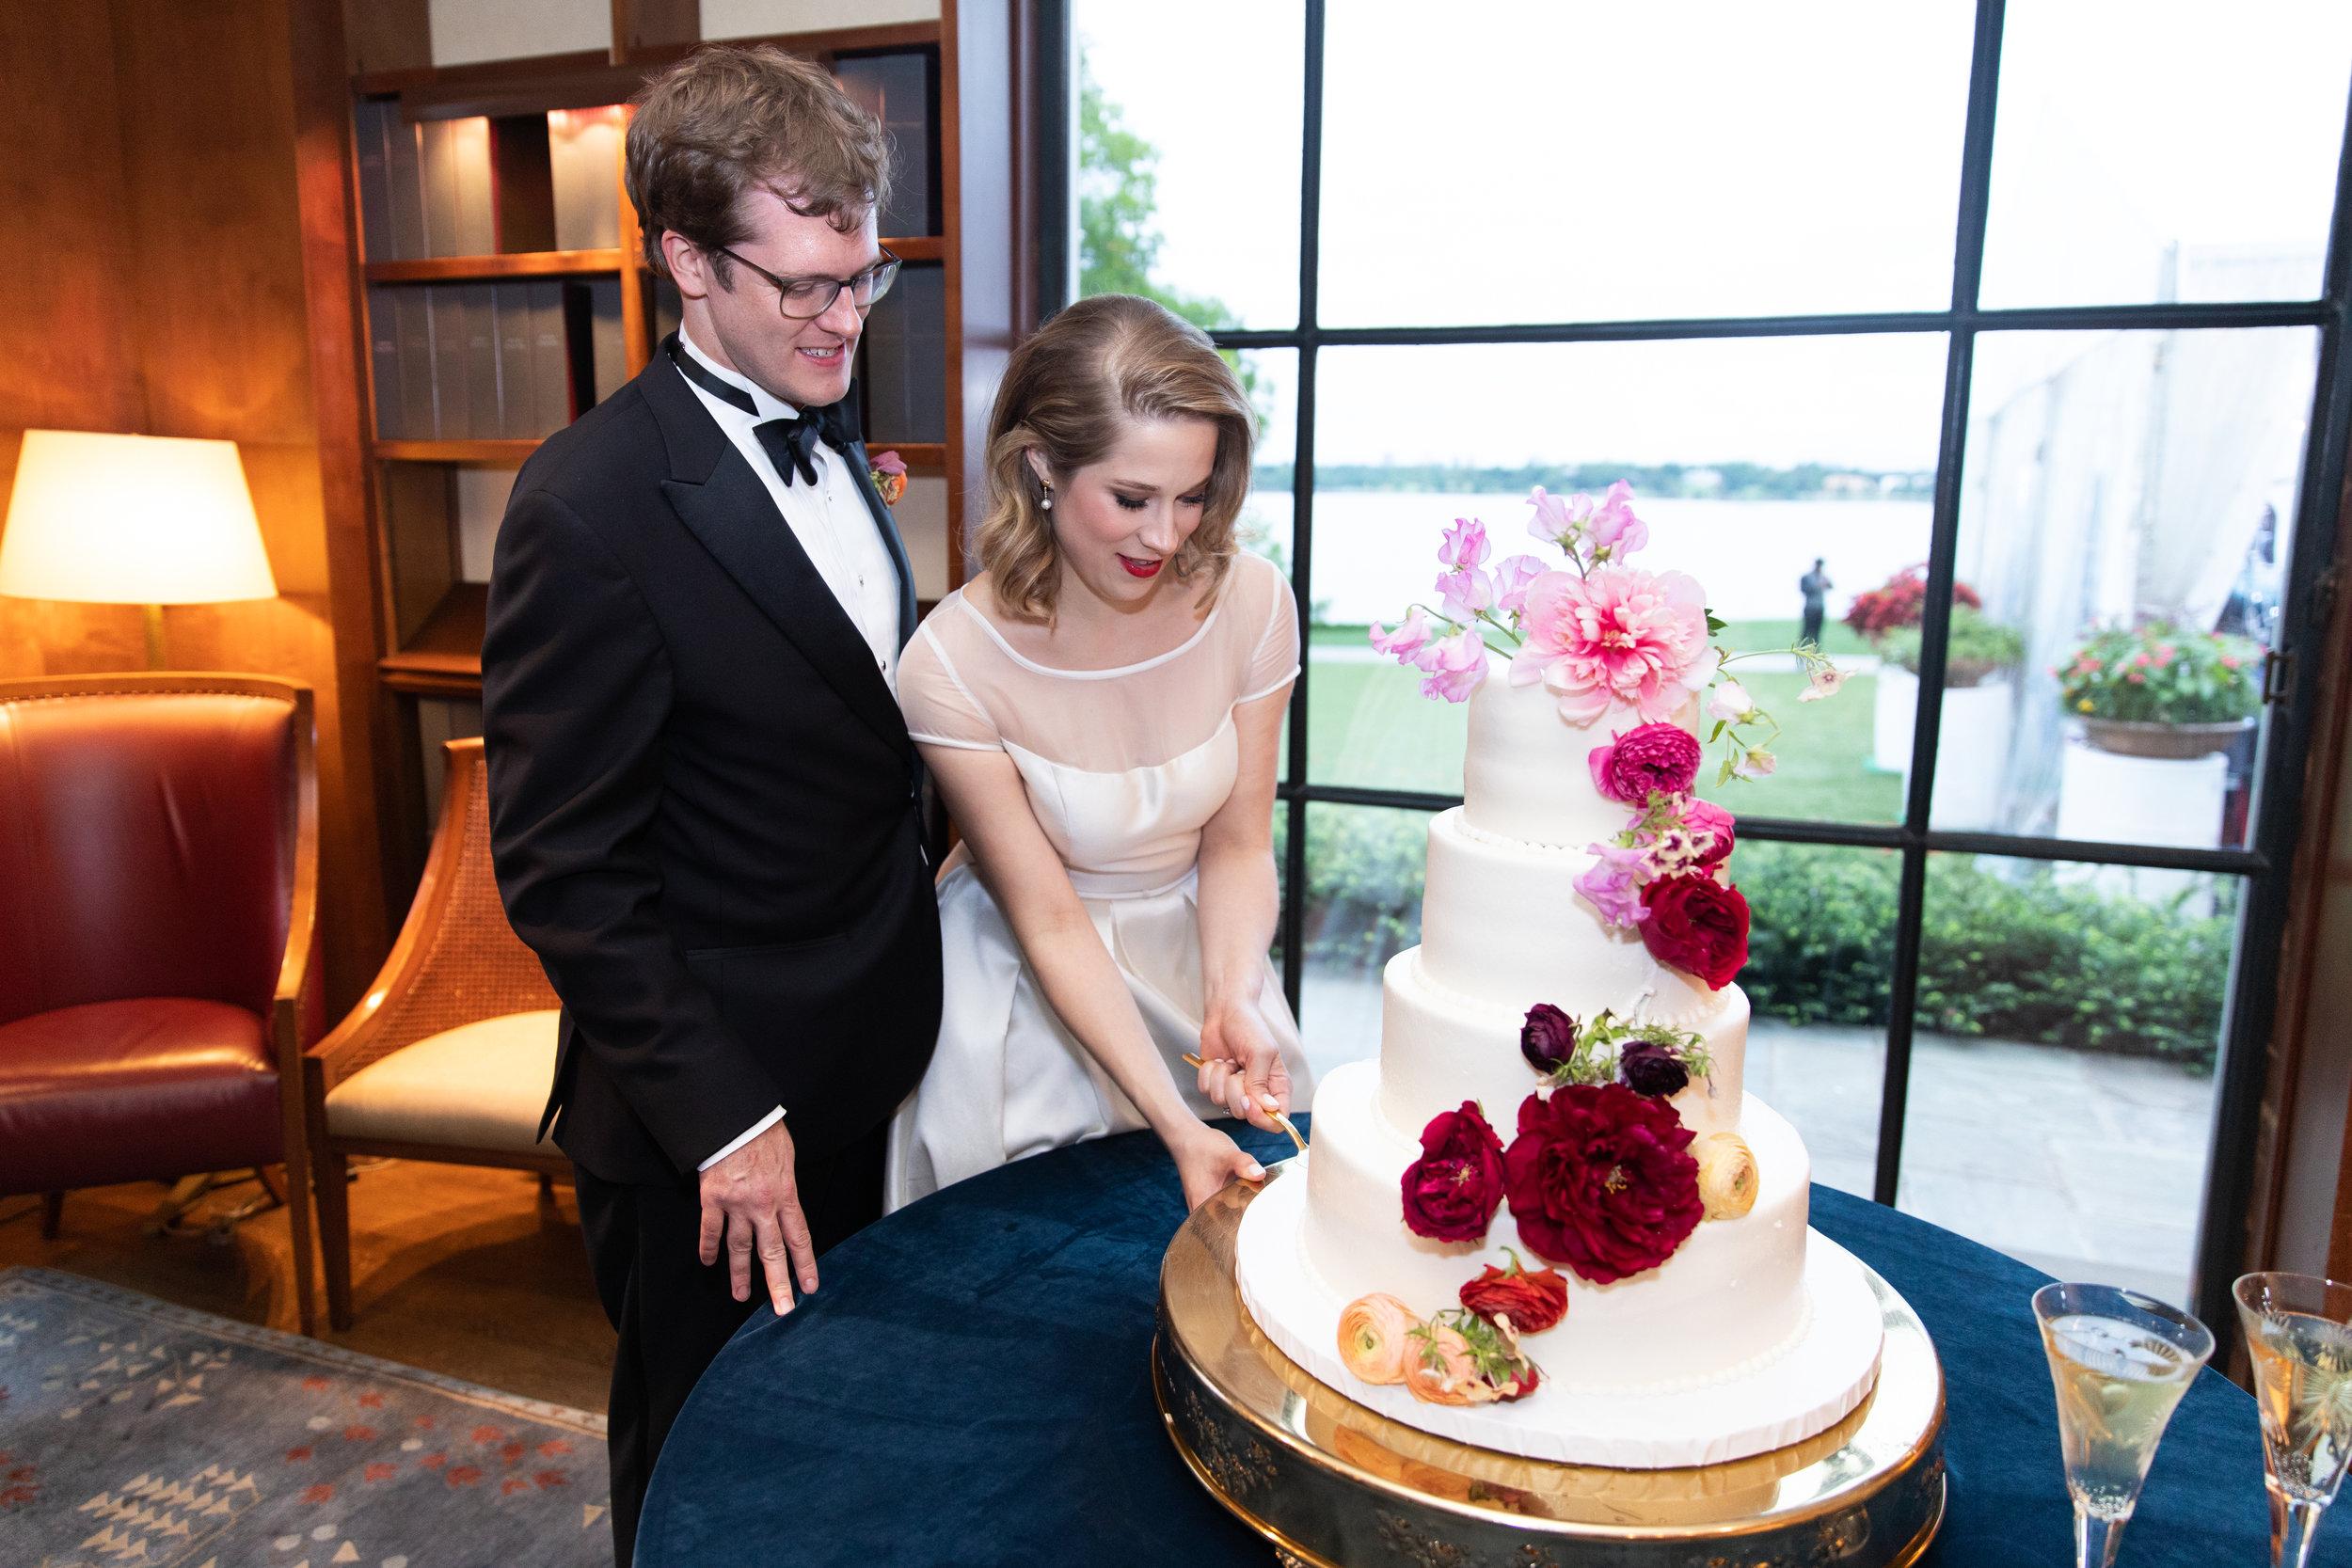 Ana-and-Nick-cutting-cake-The-Dallas-Arboretum-Ivory-and-Vine.jpg